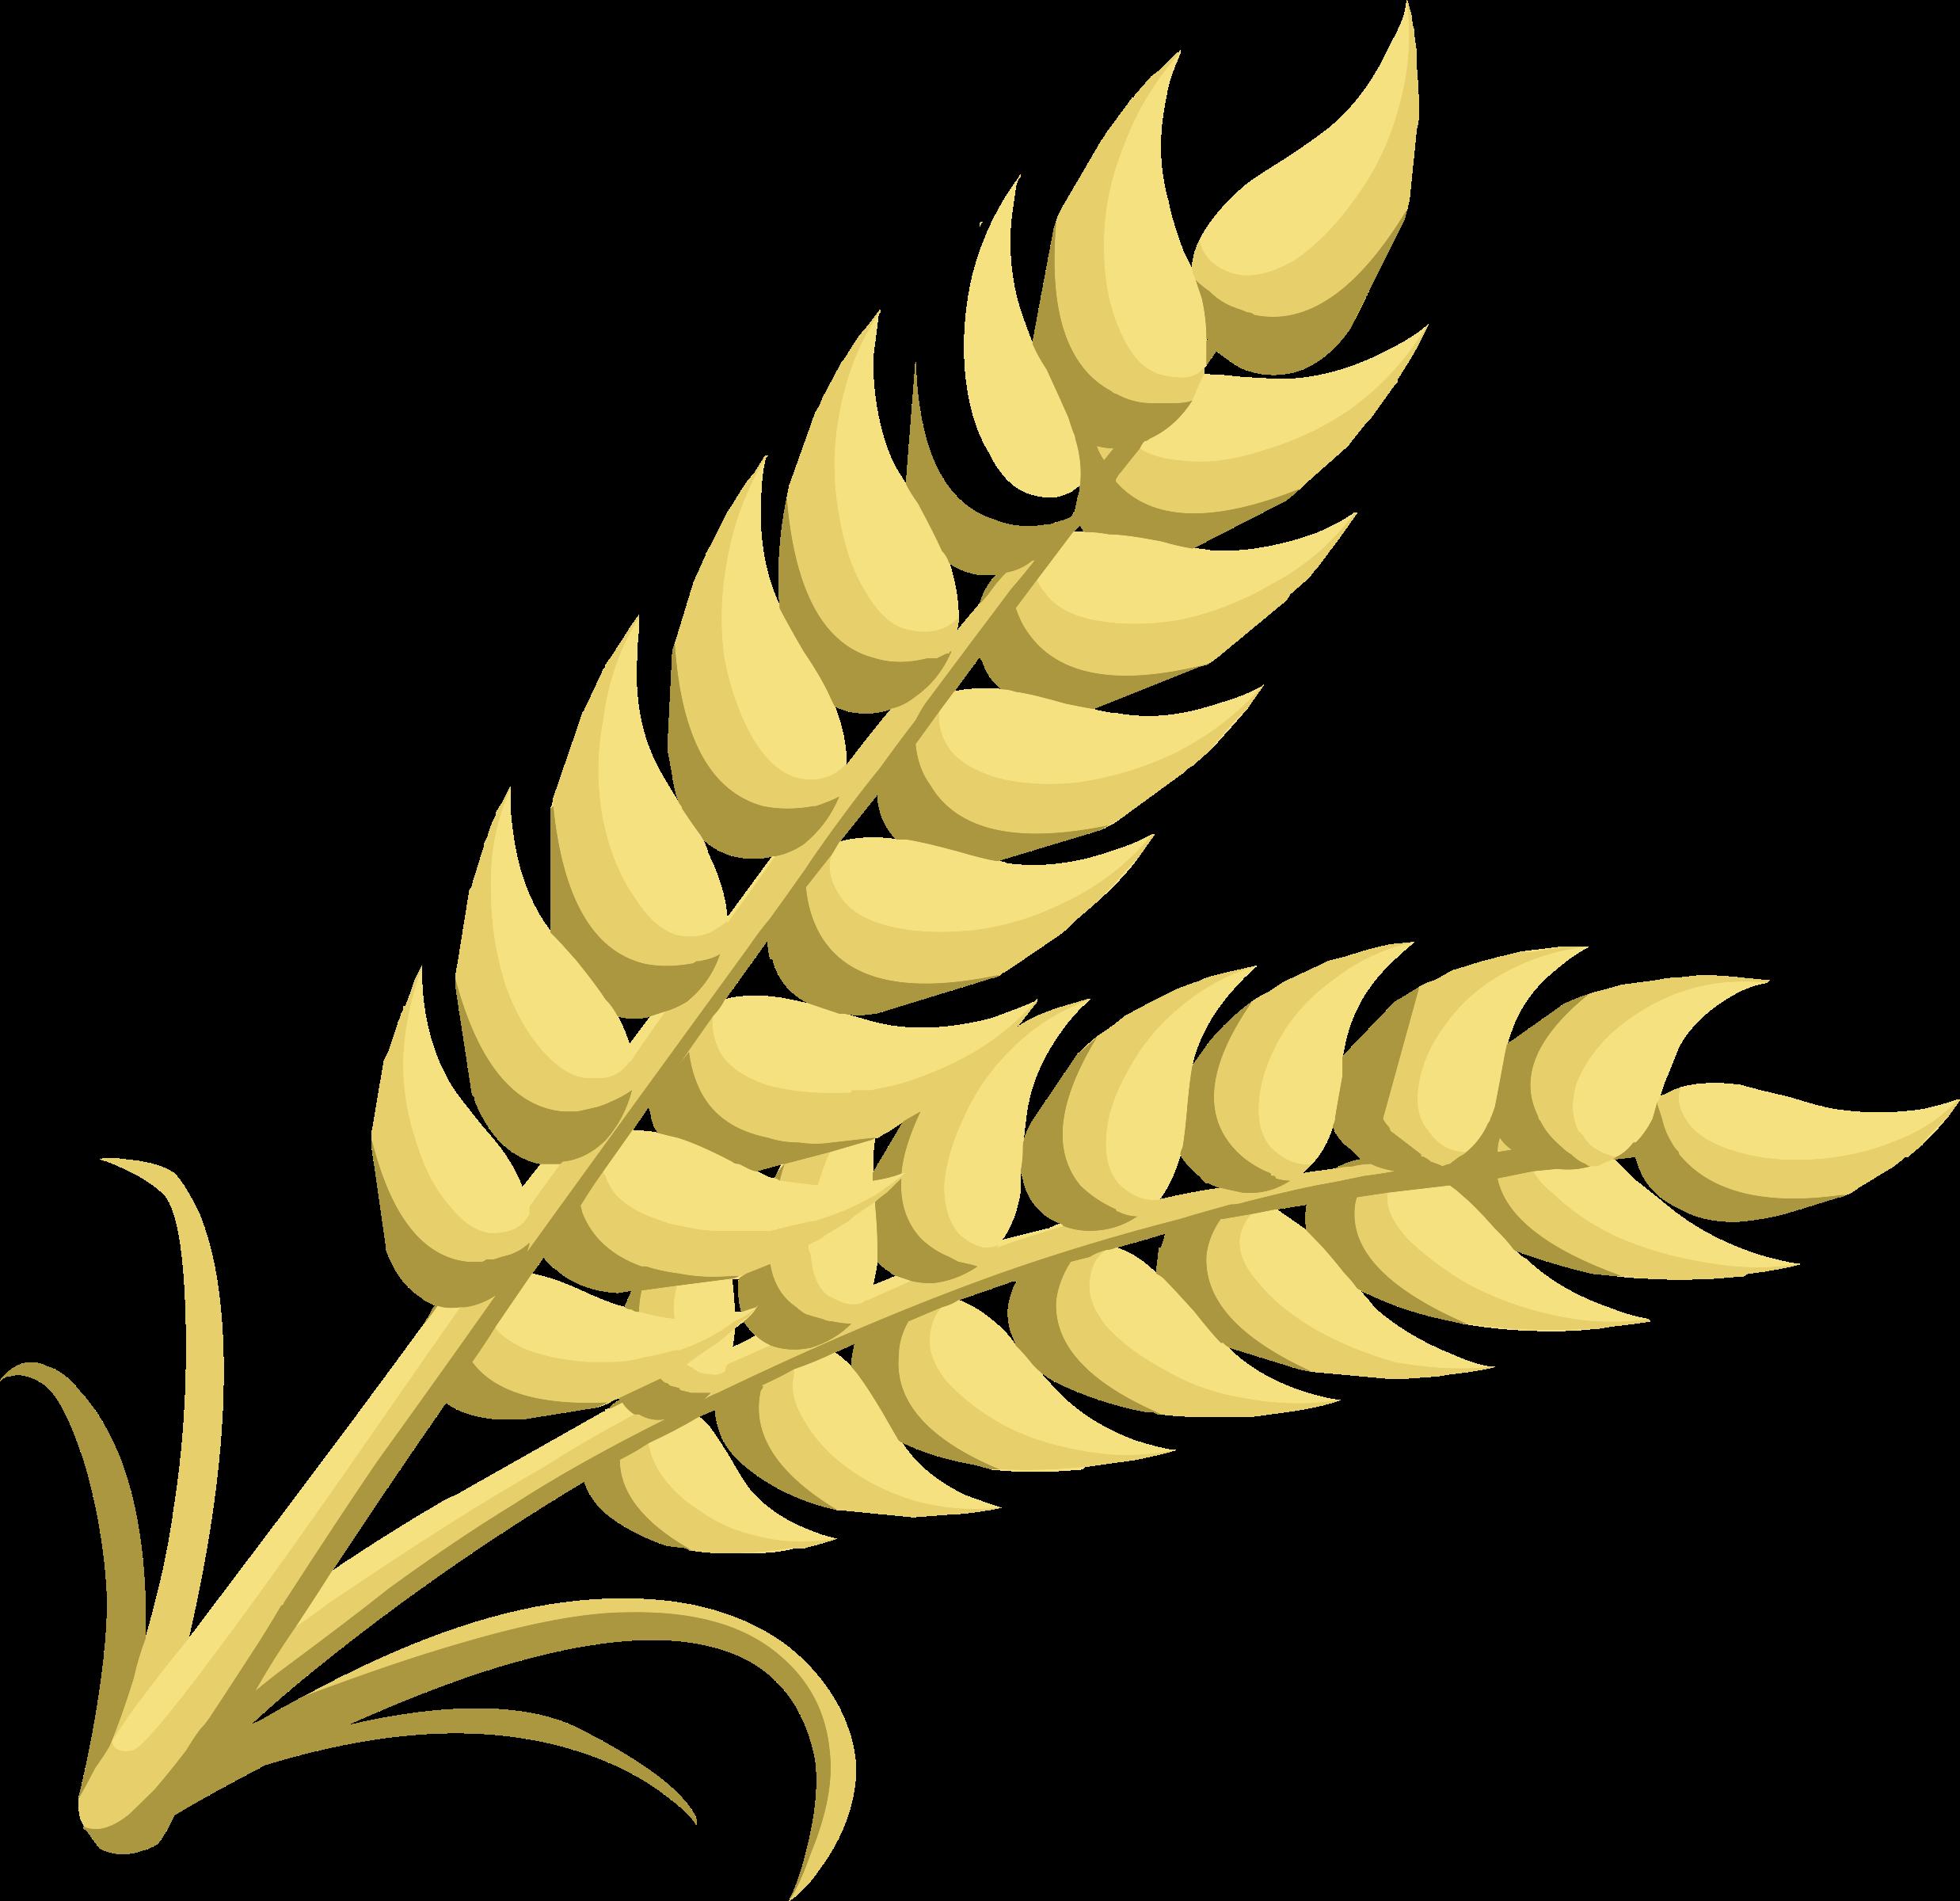 Whole grain free clipart